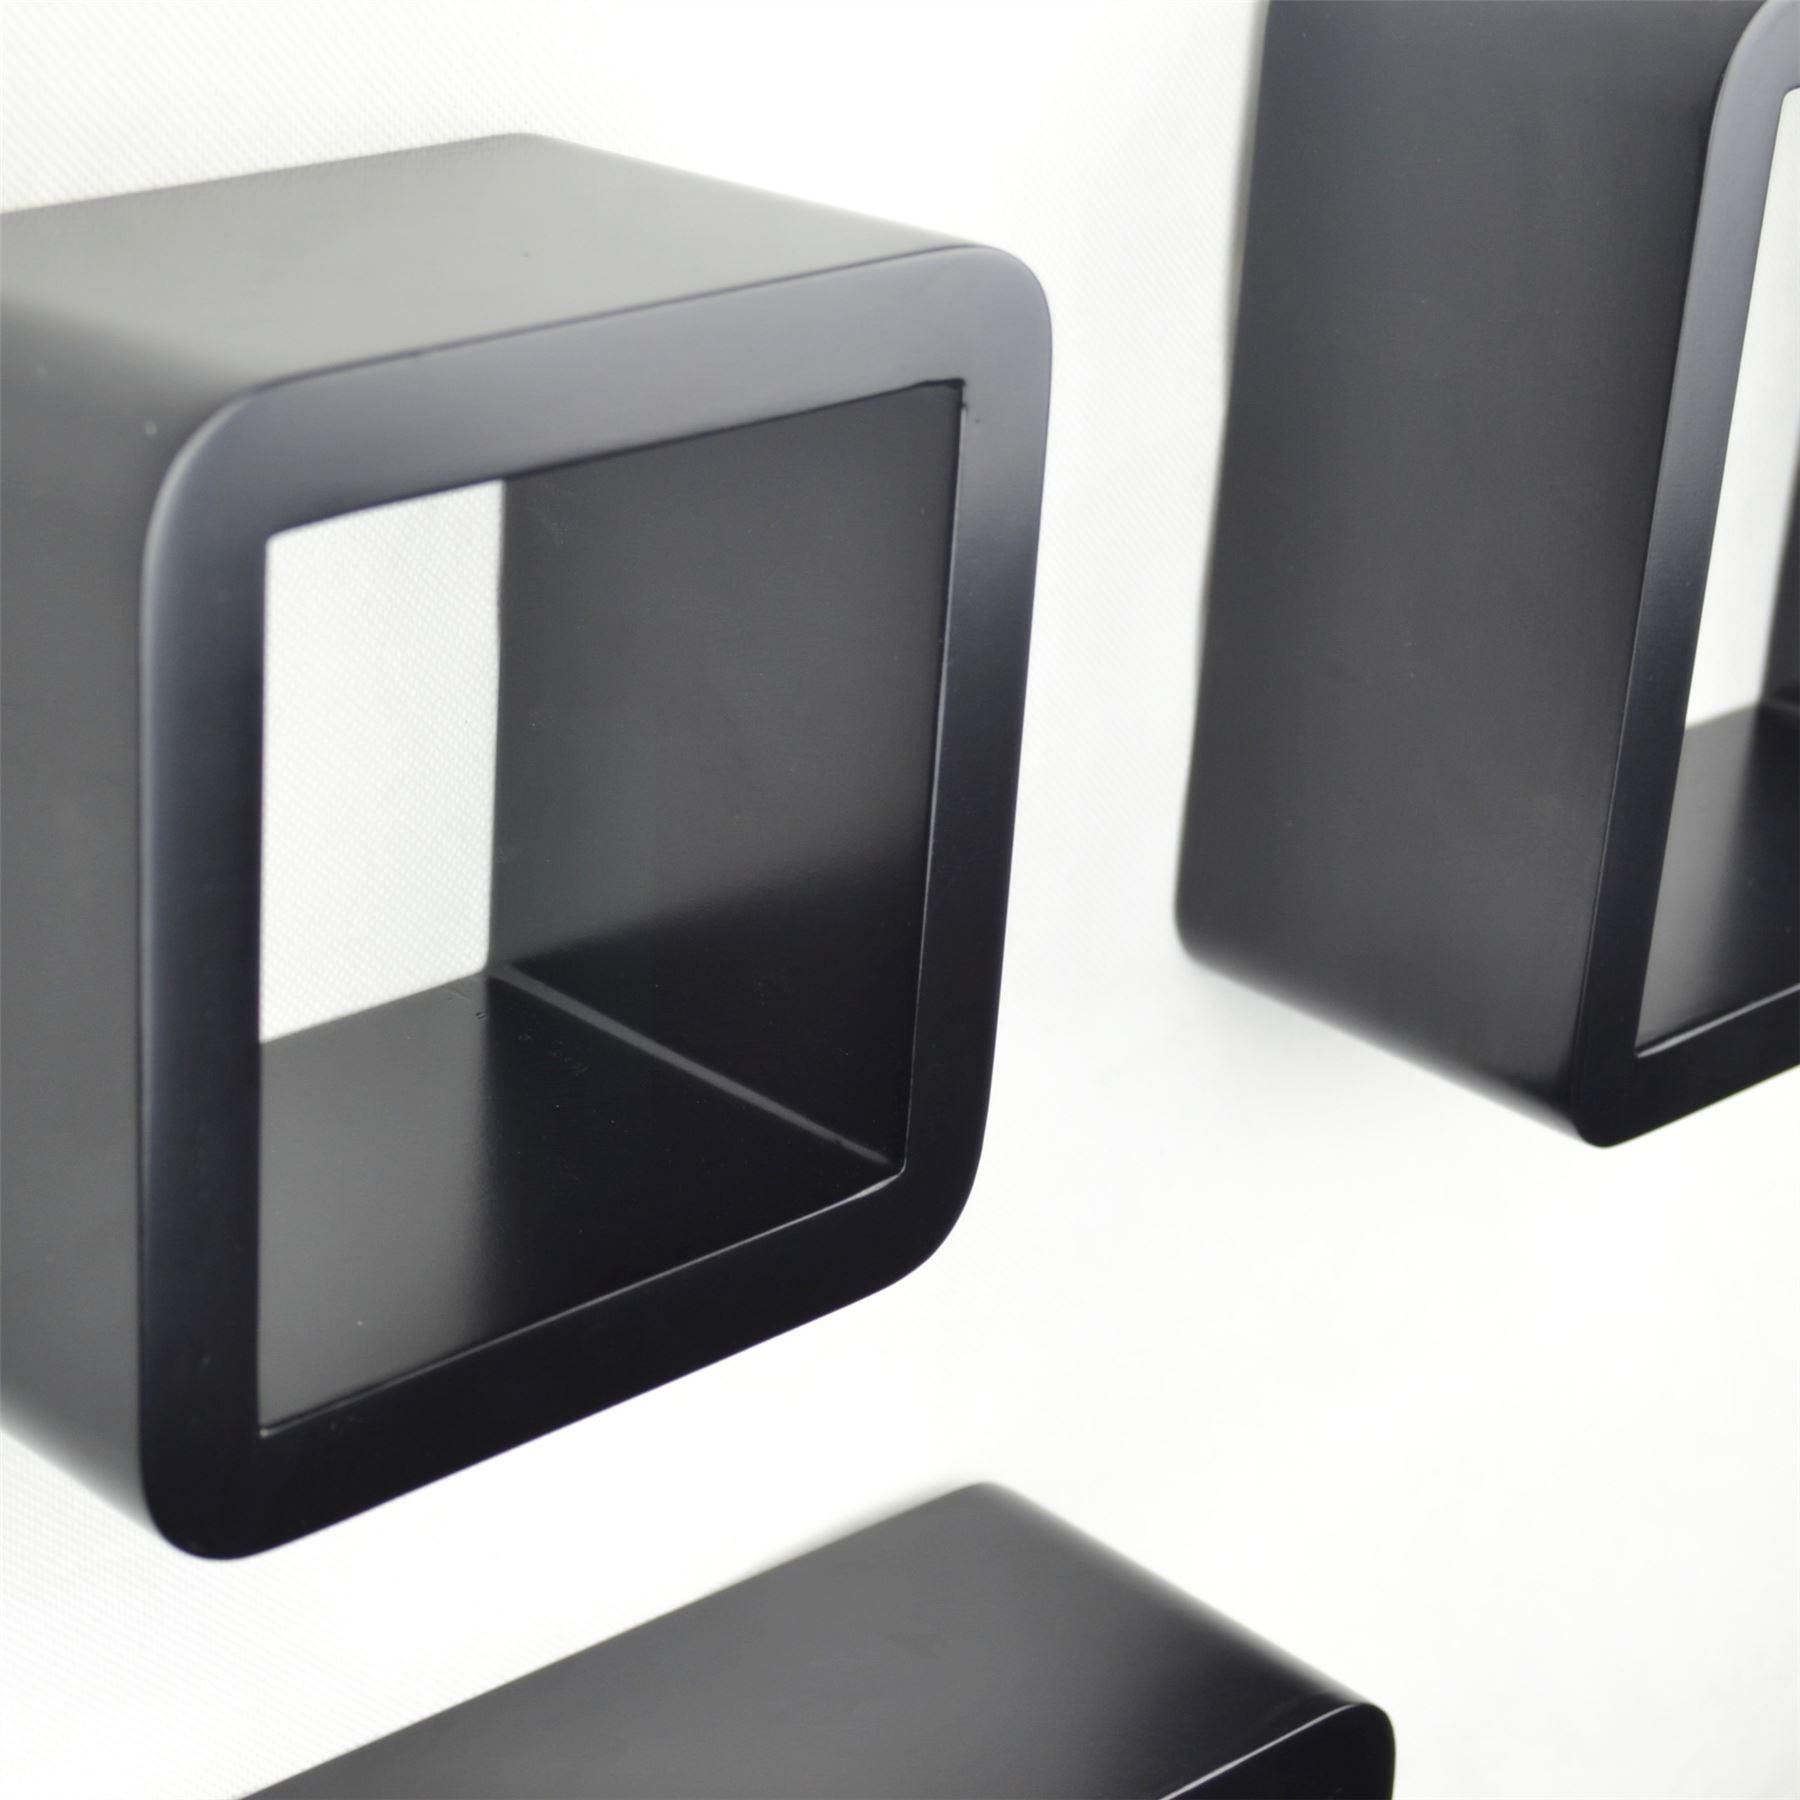 cube wall shelves mdf set of  pcs of shelf round corner floating  - cubewallshelvesmdfsetofpcs